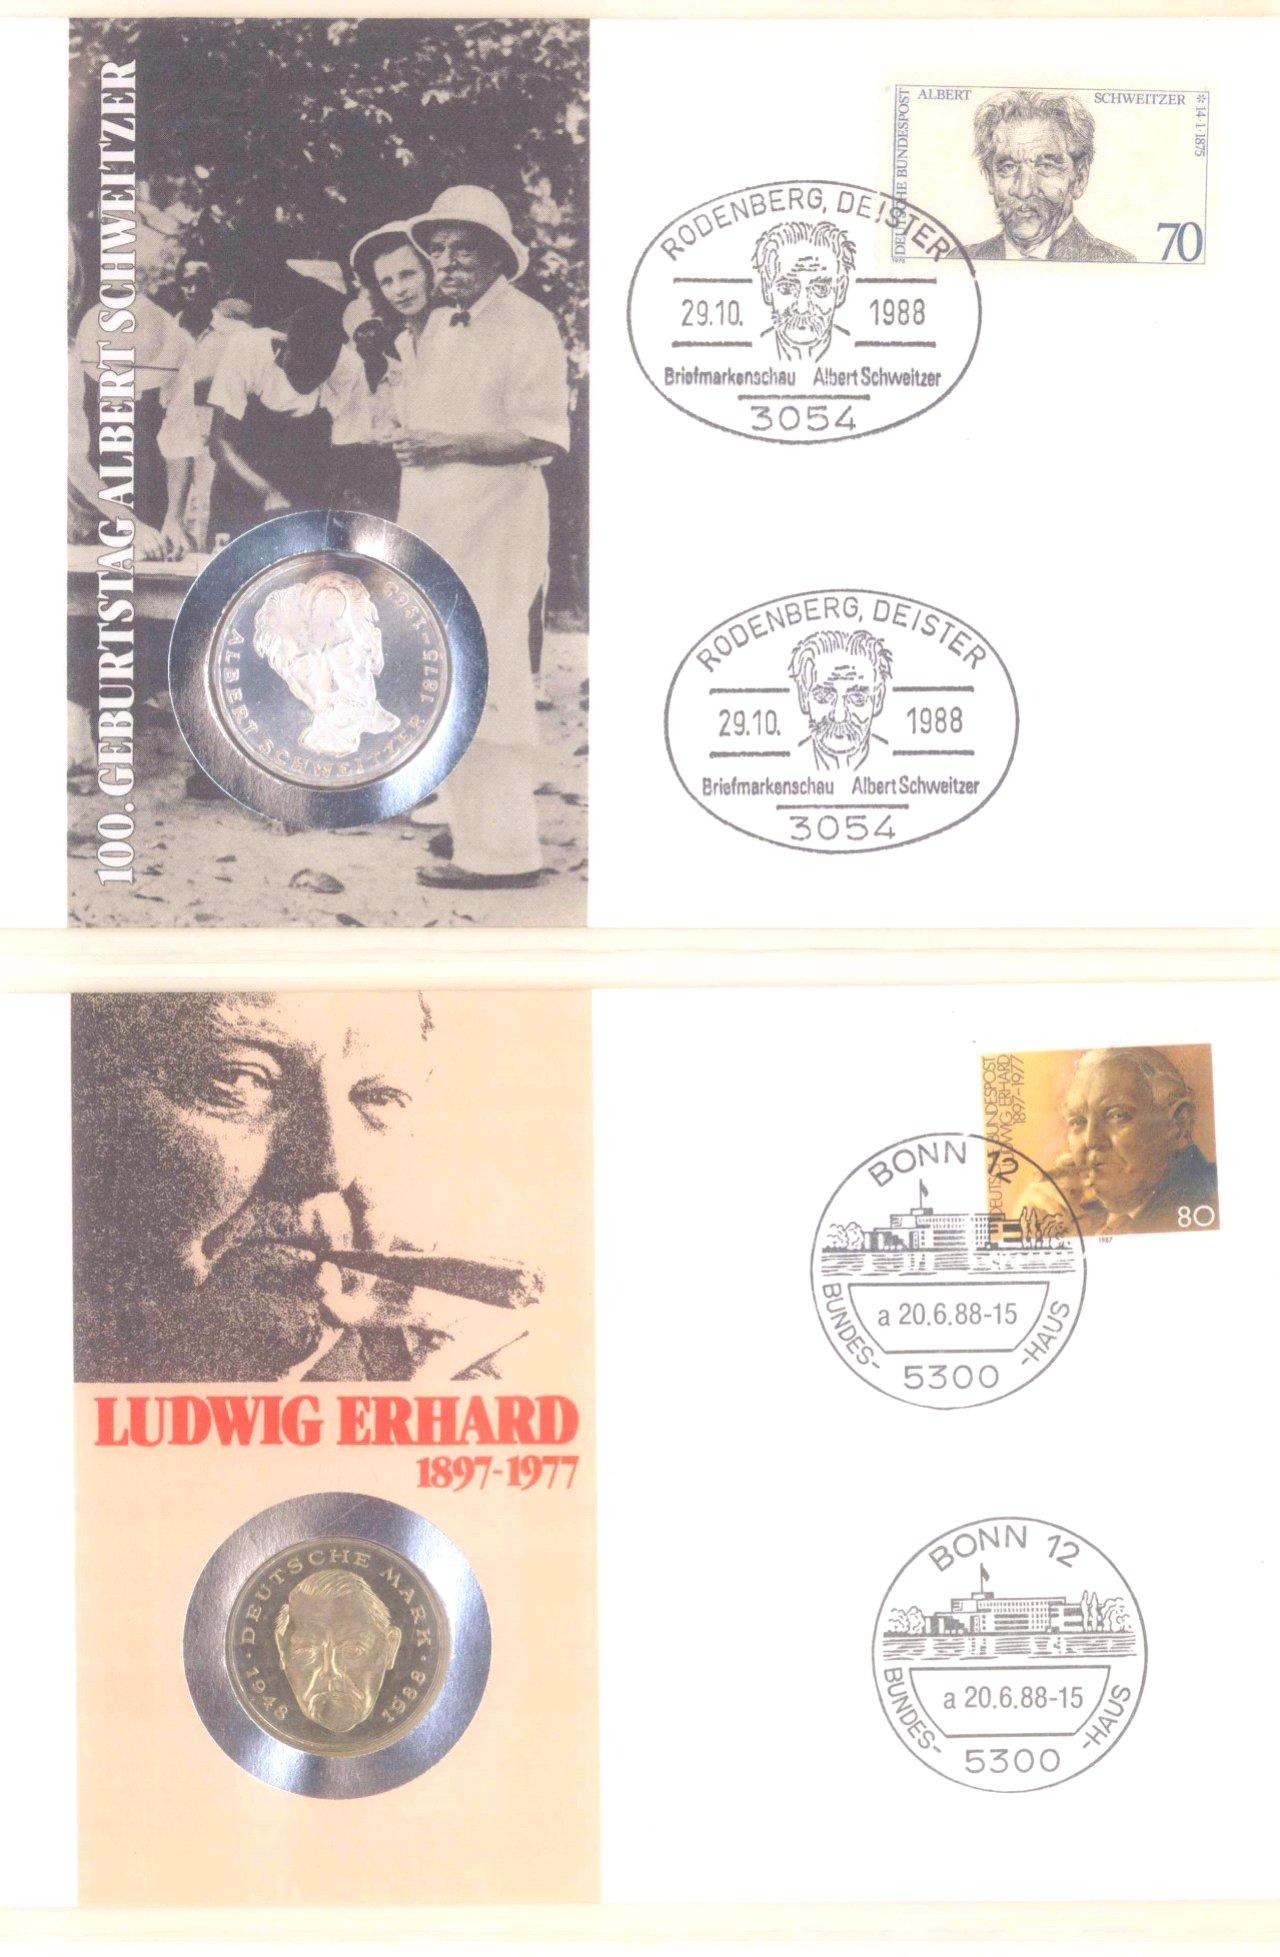 Sammlung Borek Numisbriefe im Ringbinder-18